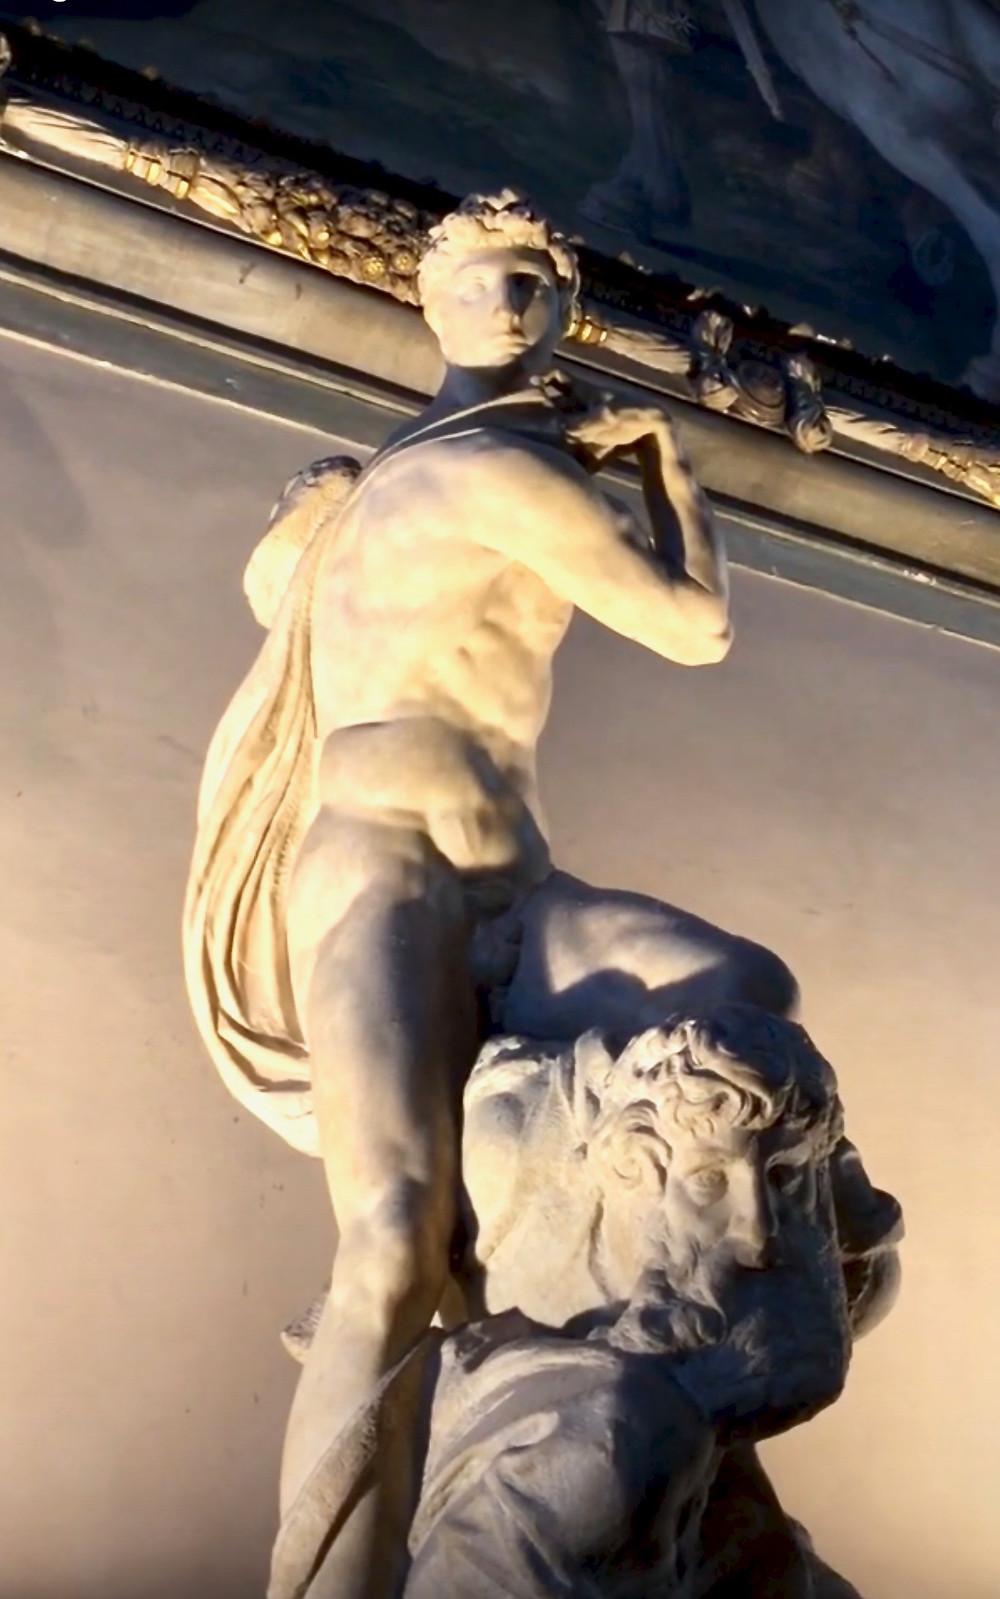 Michelangelo's Genius of Victory in the Palazzo Vecchio